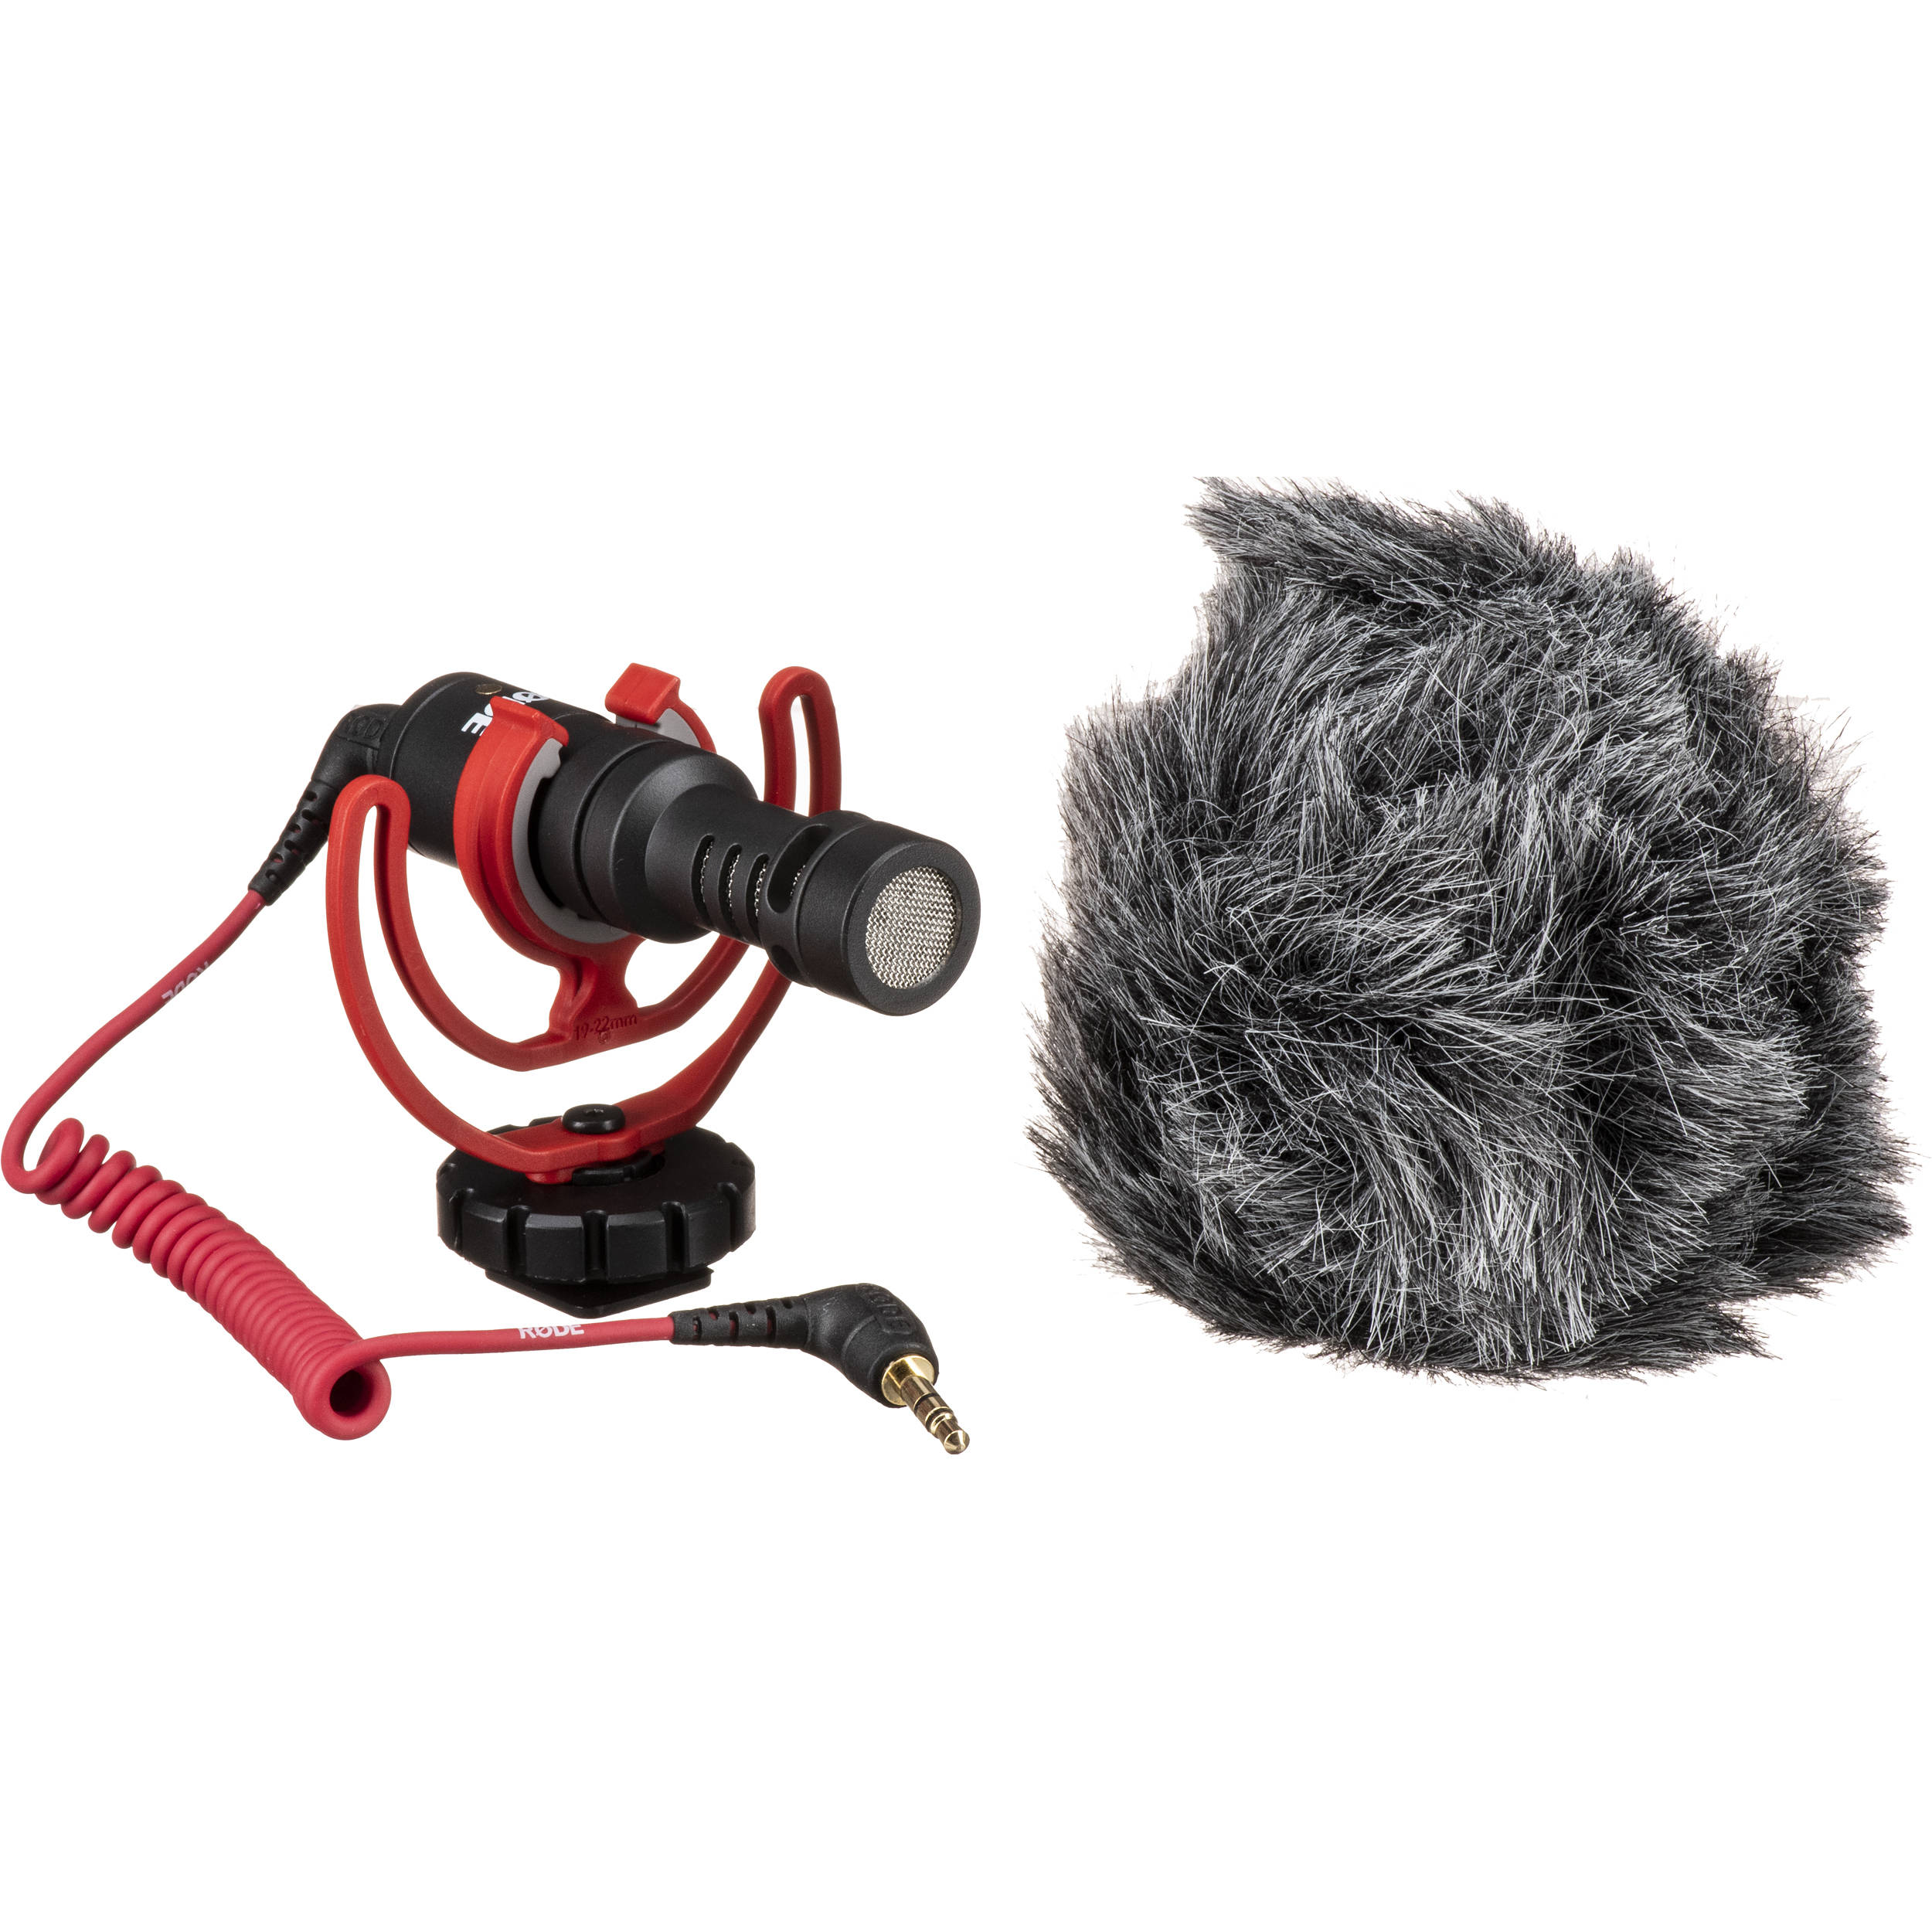 Rode VideoMicro Compact On-Camera Microphone VIDEOMICRO B&H